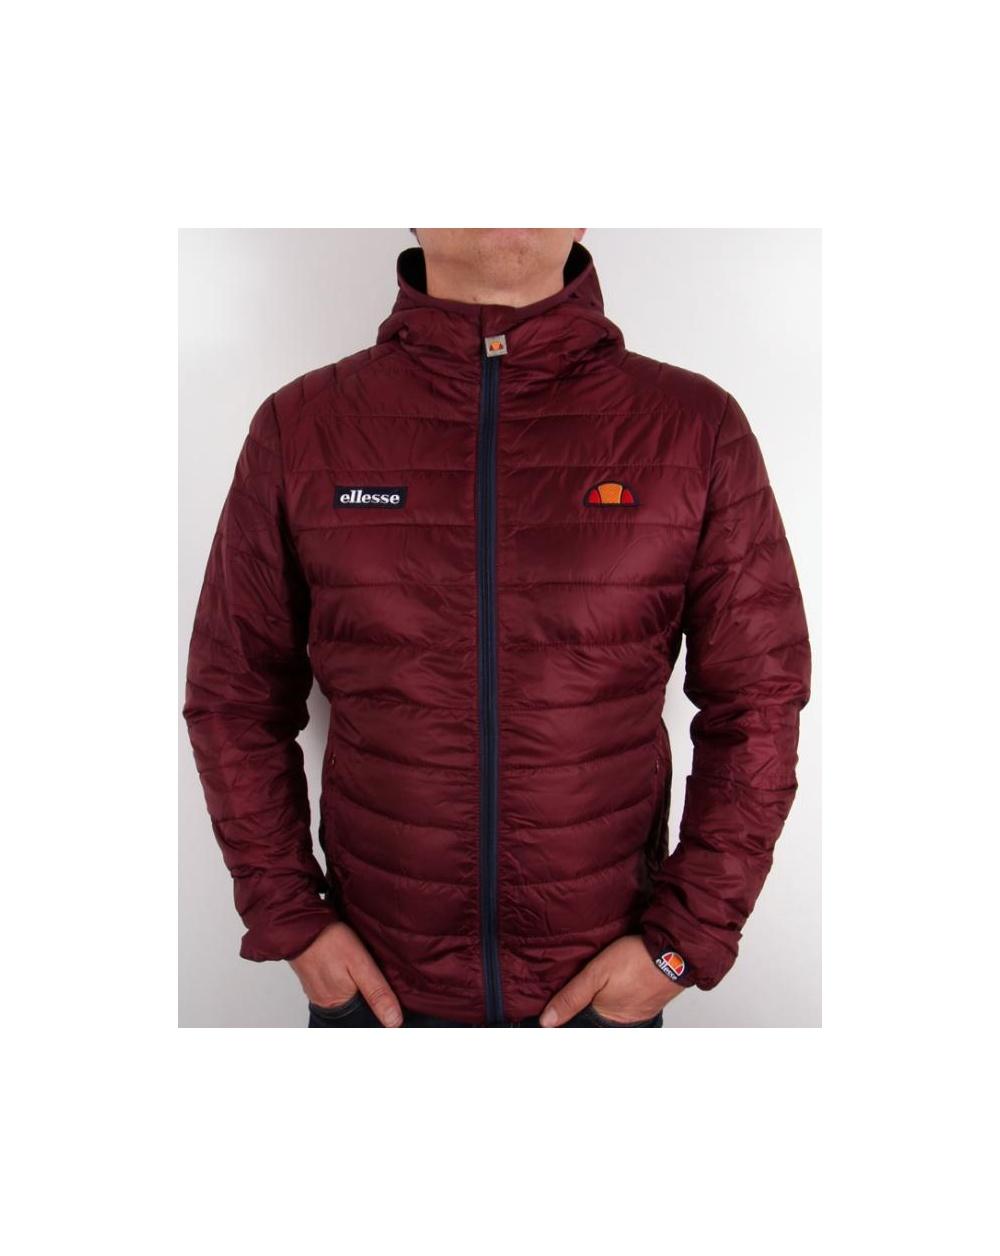 Ellesse lombardy puffer jacket burgundy puffa